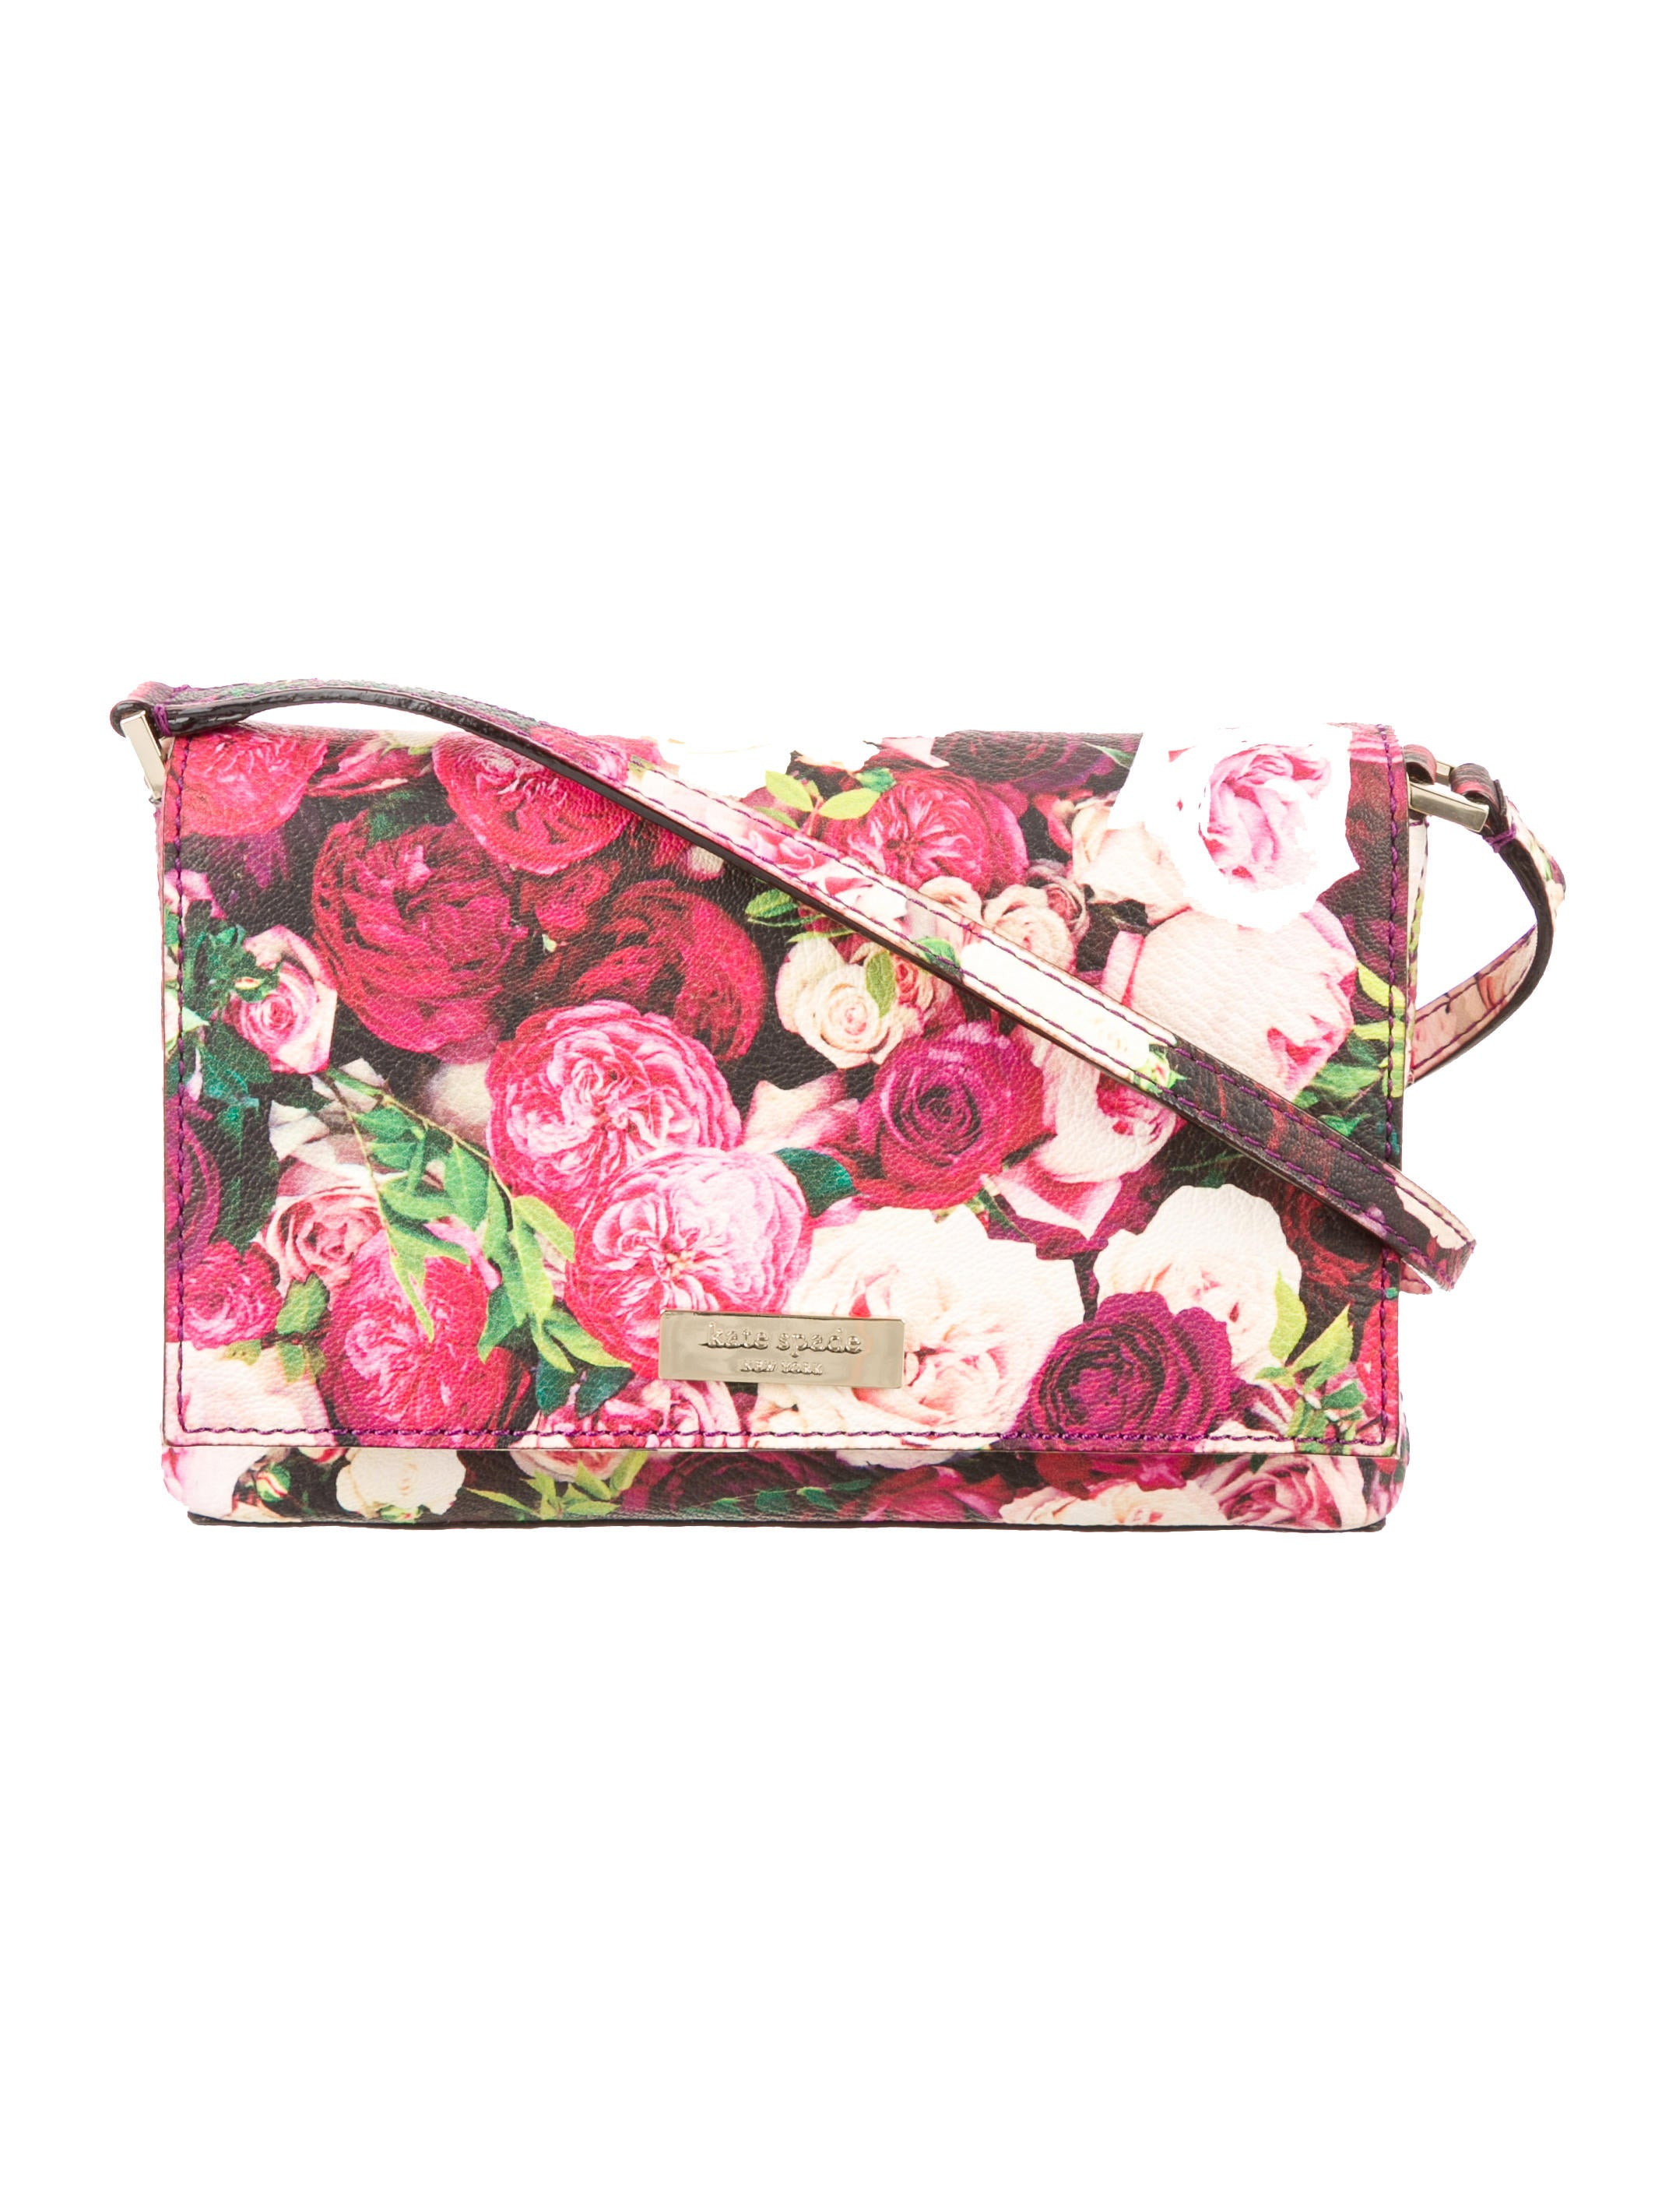 Kate Spade New York Grant Street Floral Sally Crossbody Bag - Handbags - WKA59046 | The RealReal